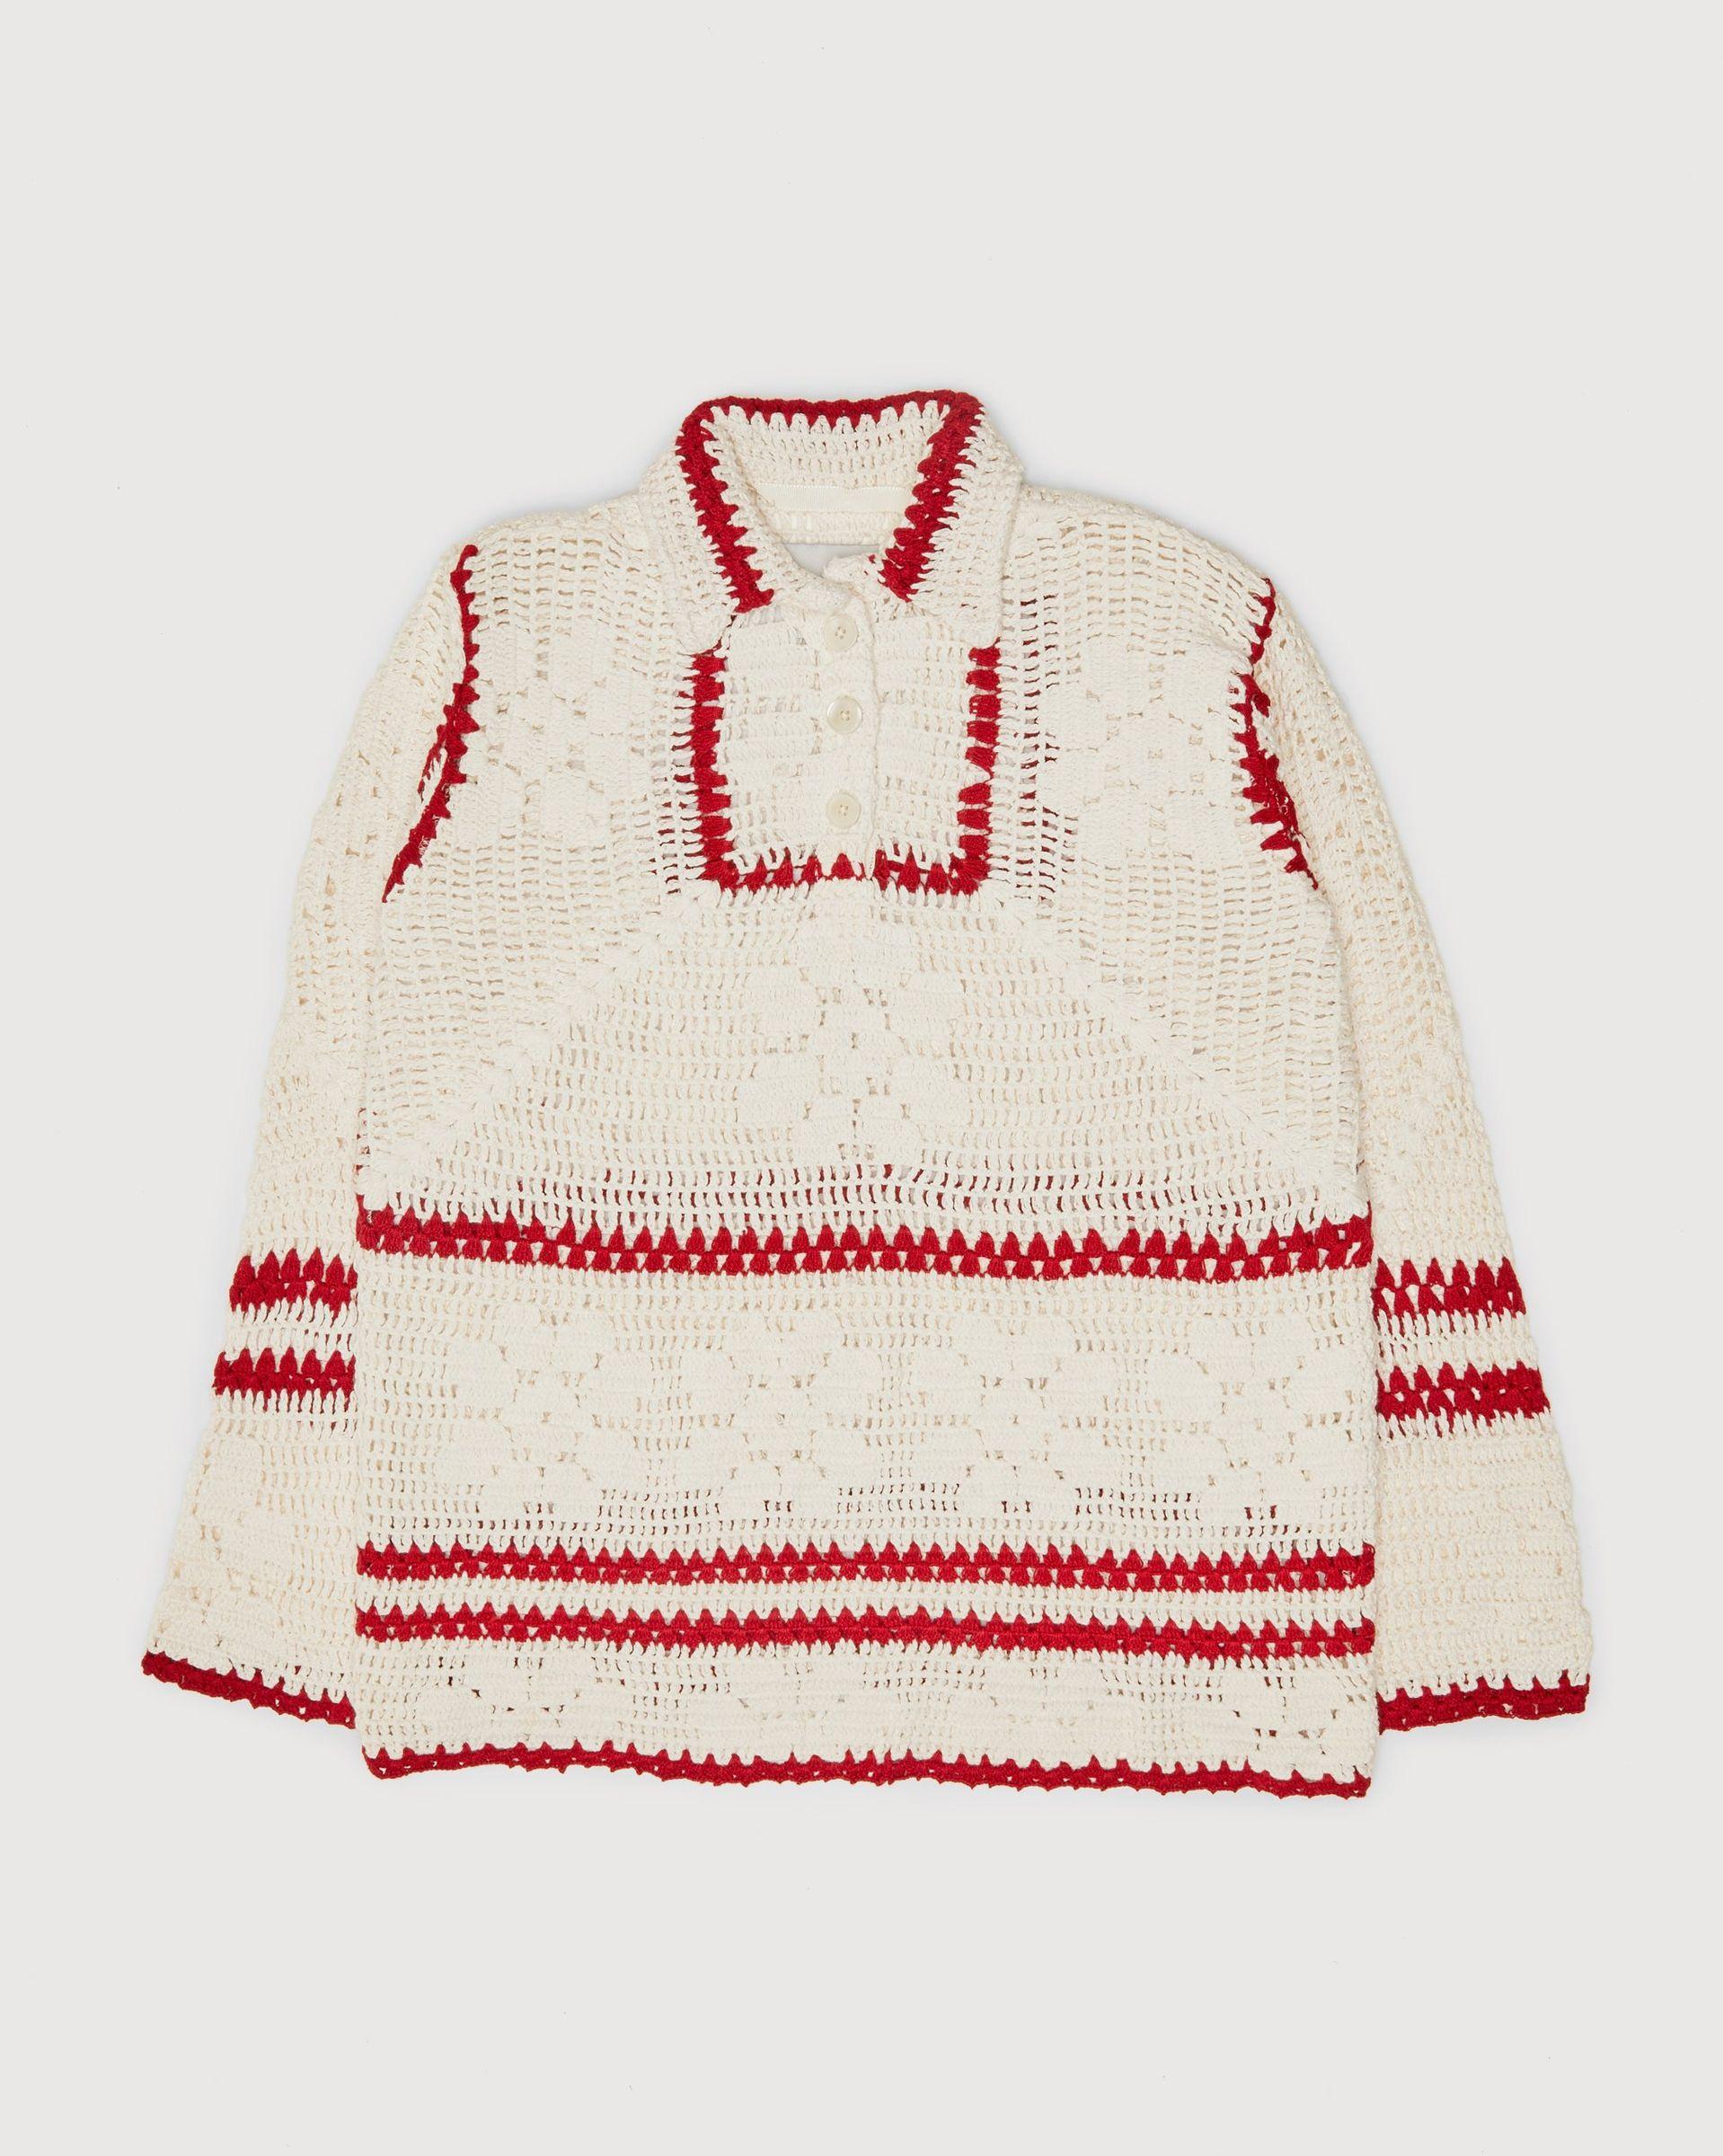 BODE - Mockneck Crochet Pullover White Red - Image 1